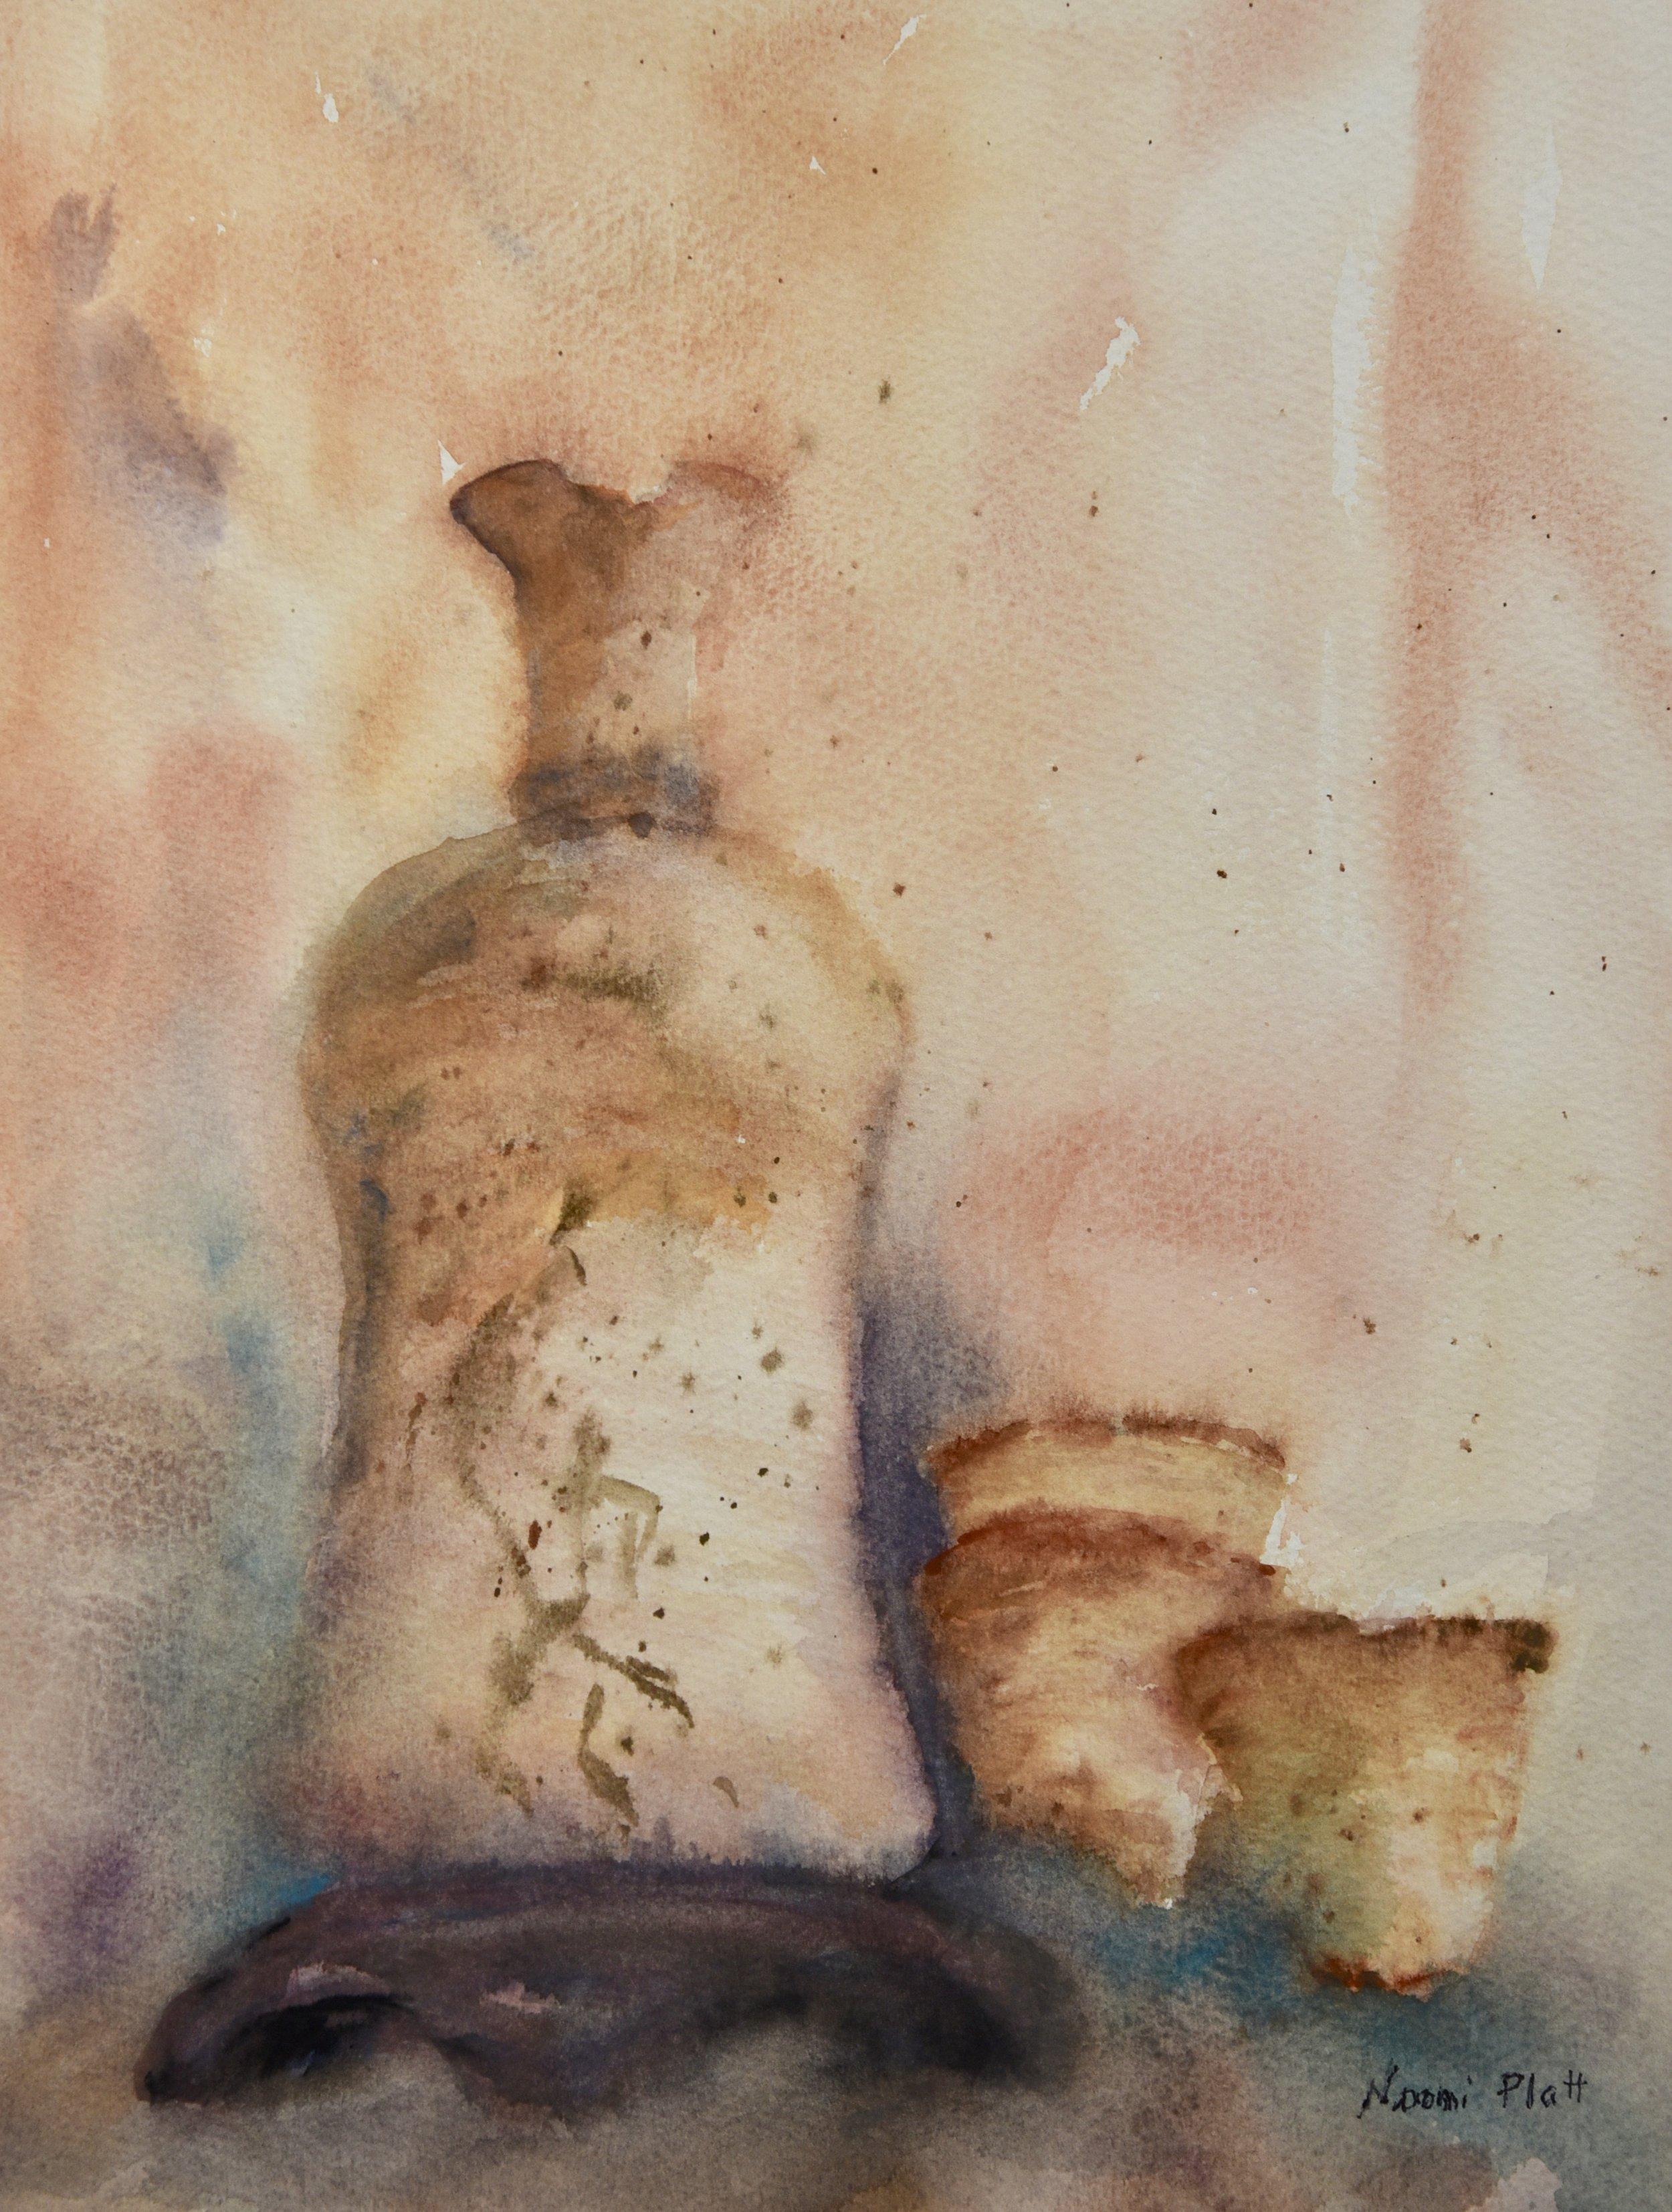 Antique Vases_11x14_95.jpg